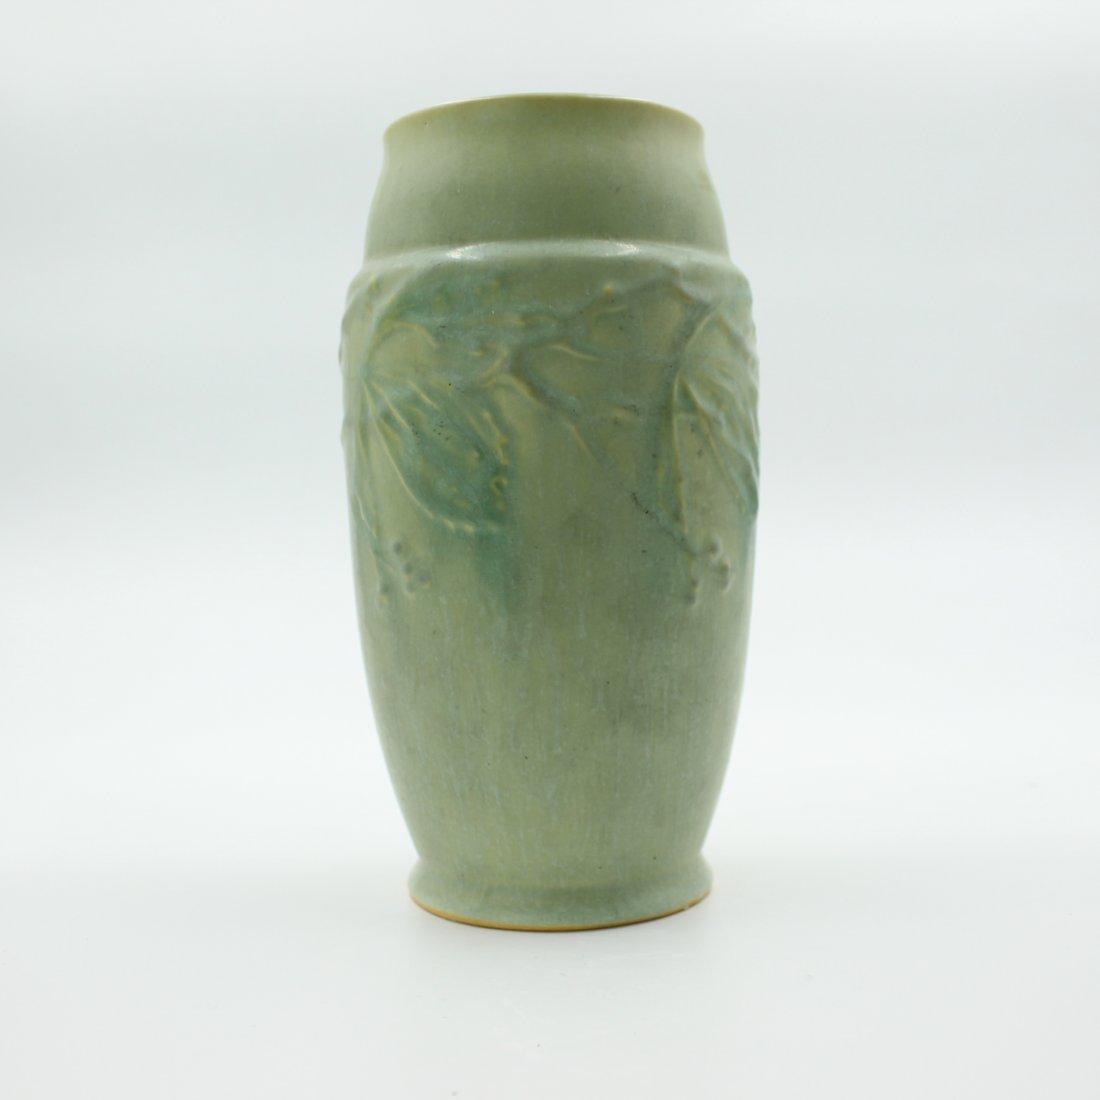 C. 1927 Roseville Cremona Vase #355-8 - 2